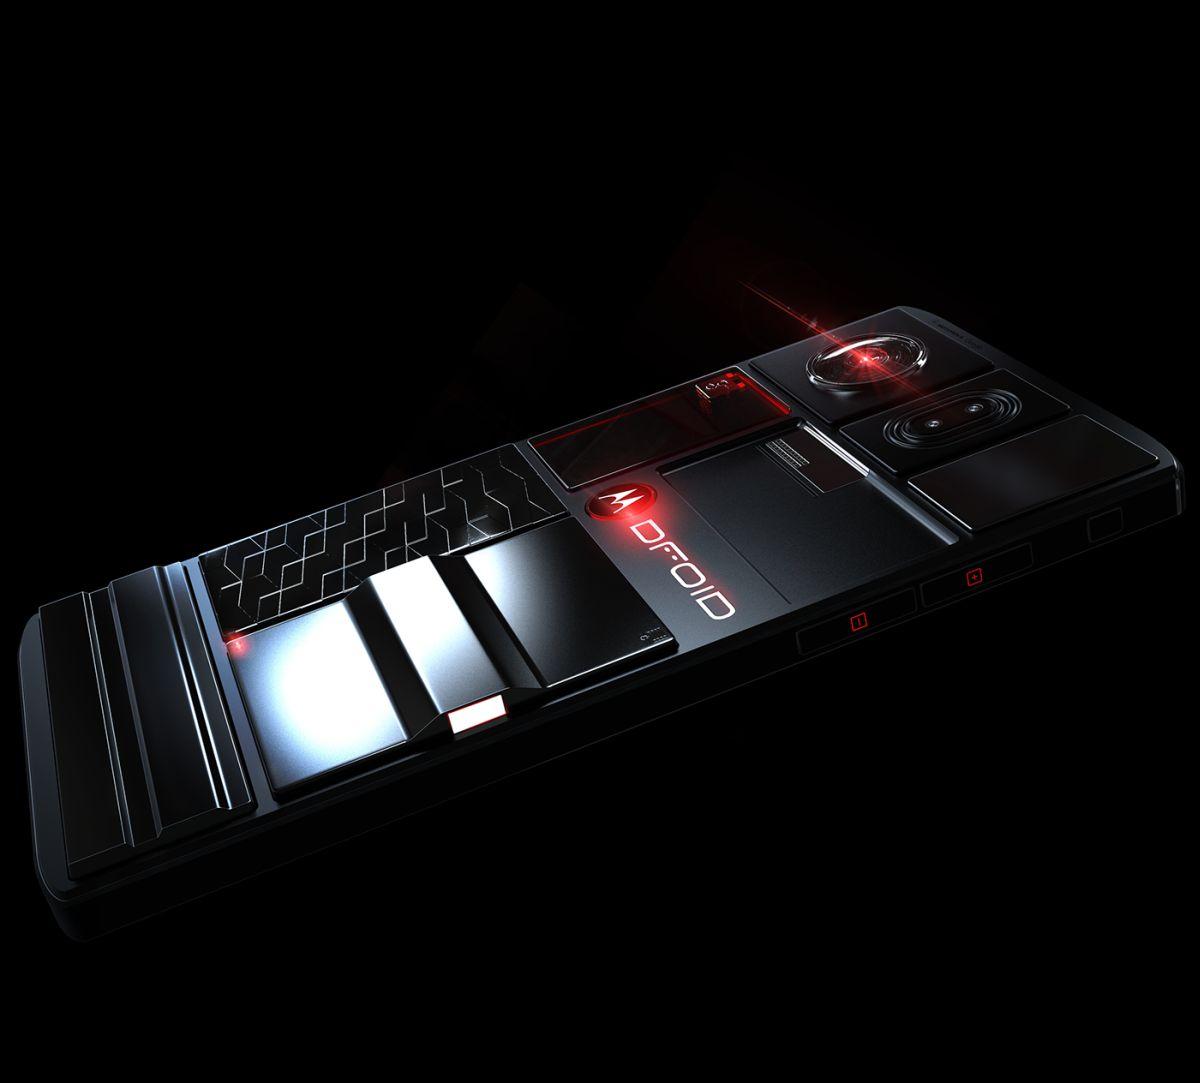 The Moto Droid Genesis!